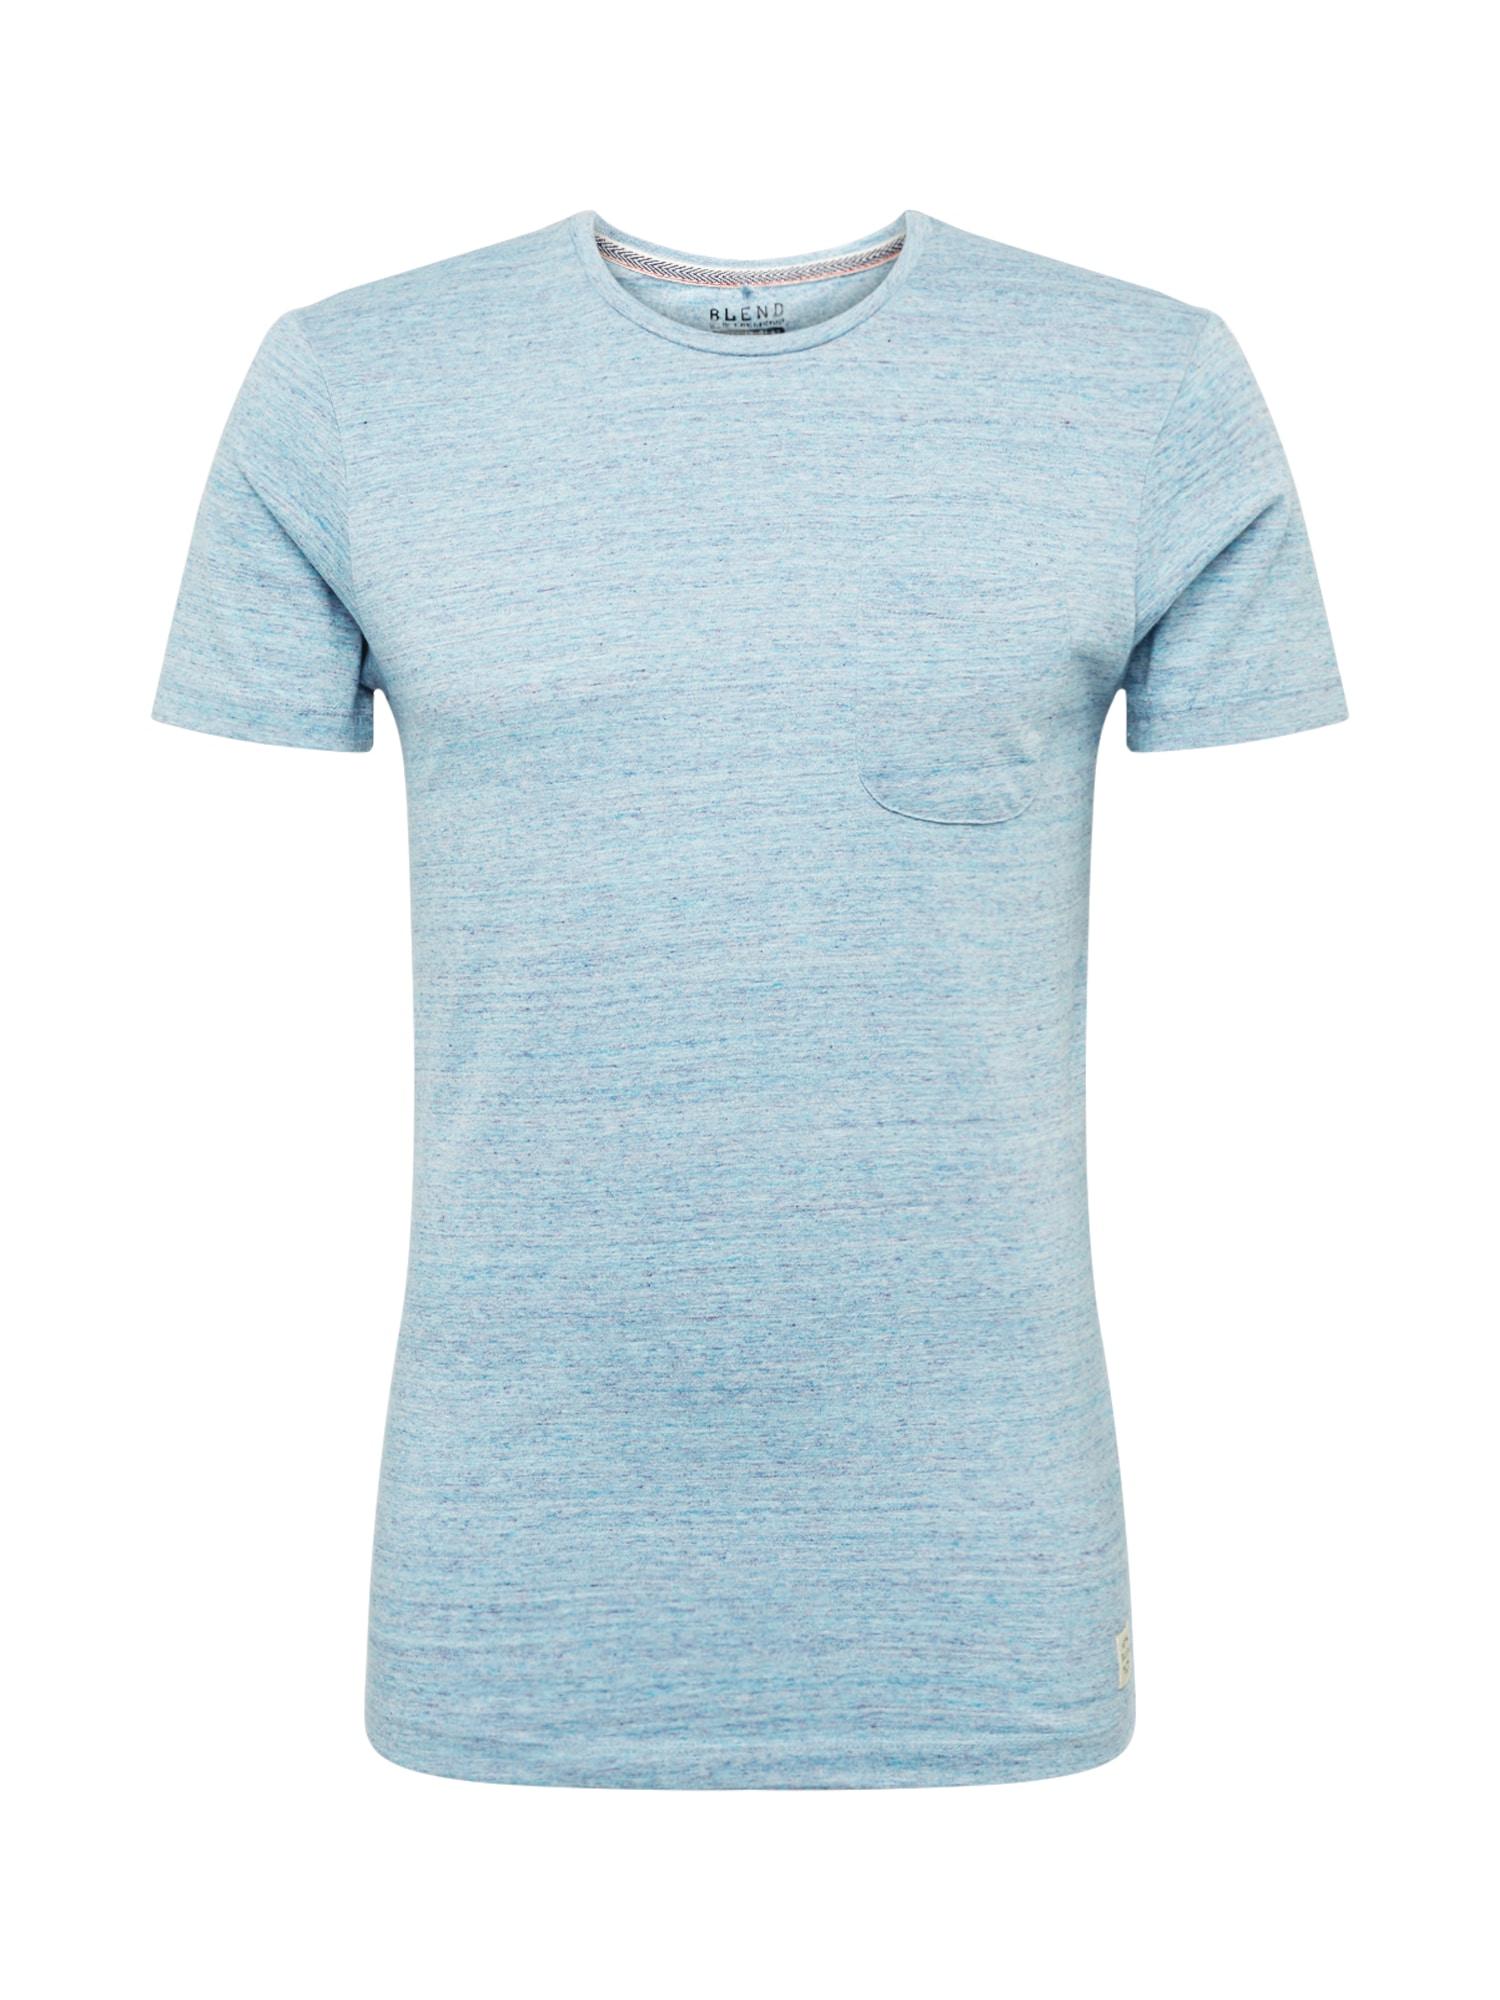 BLEND Marškinėliai mėlyna